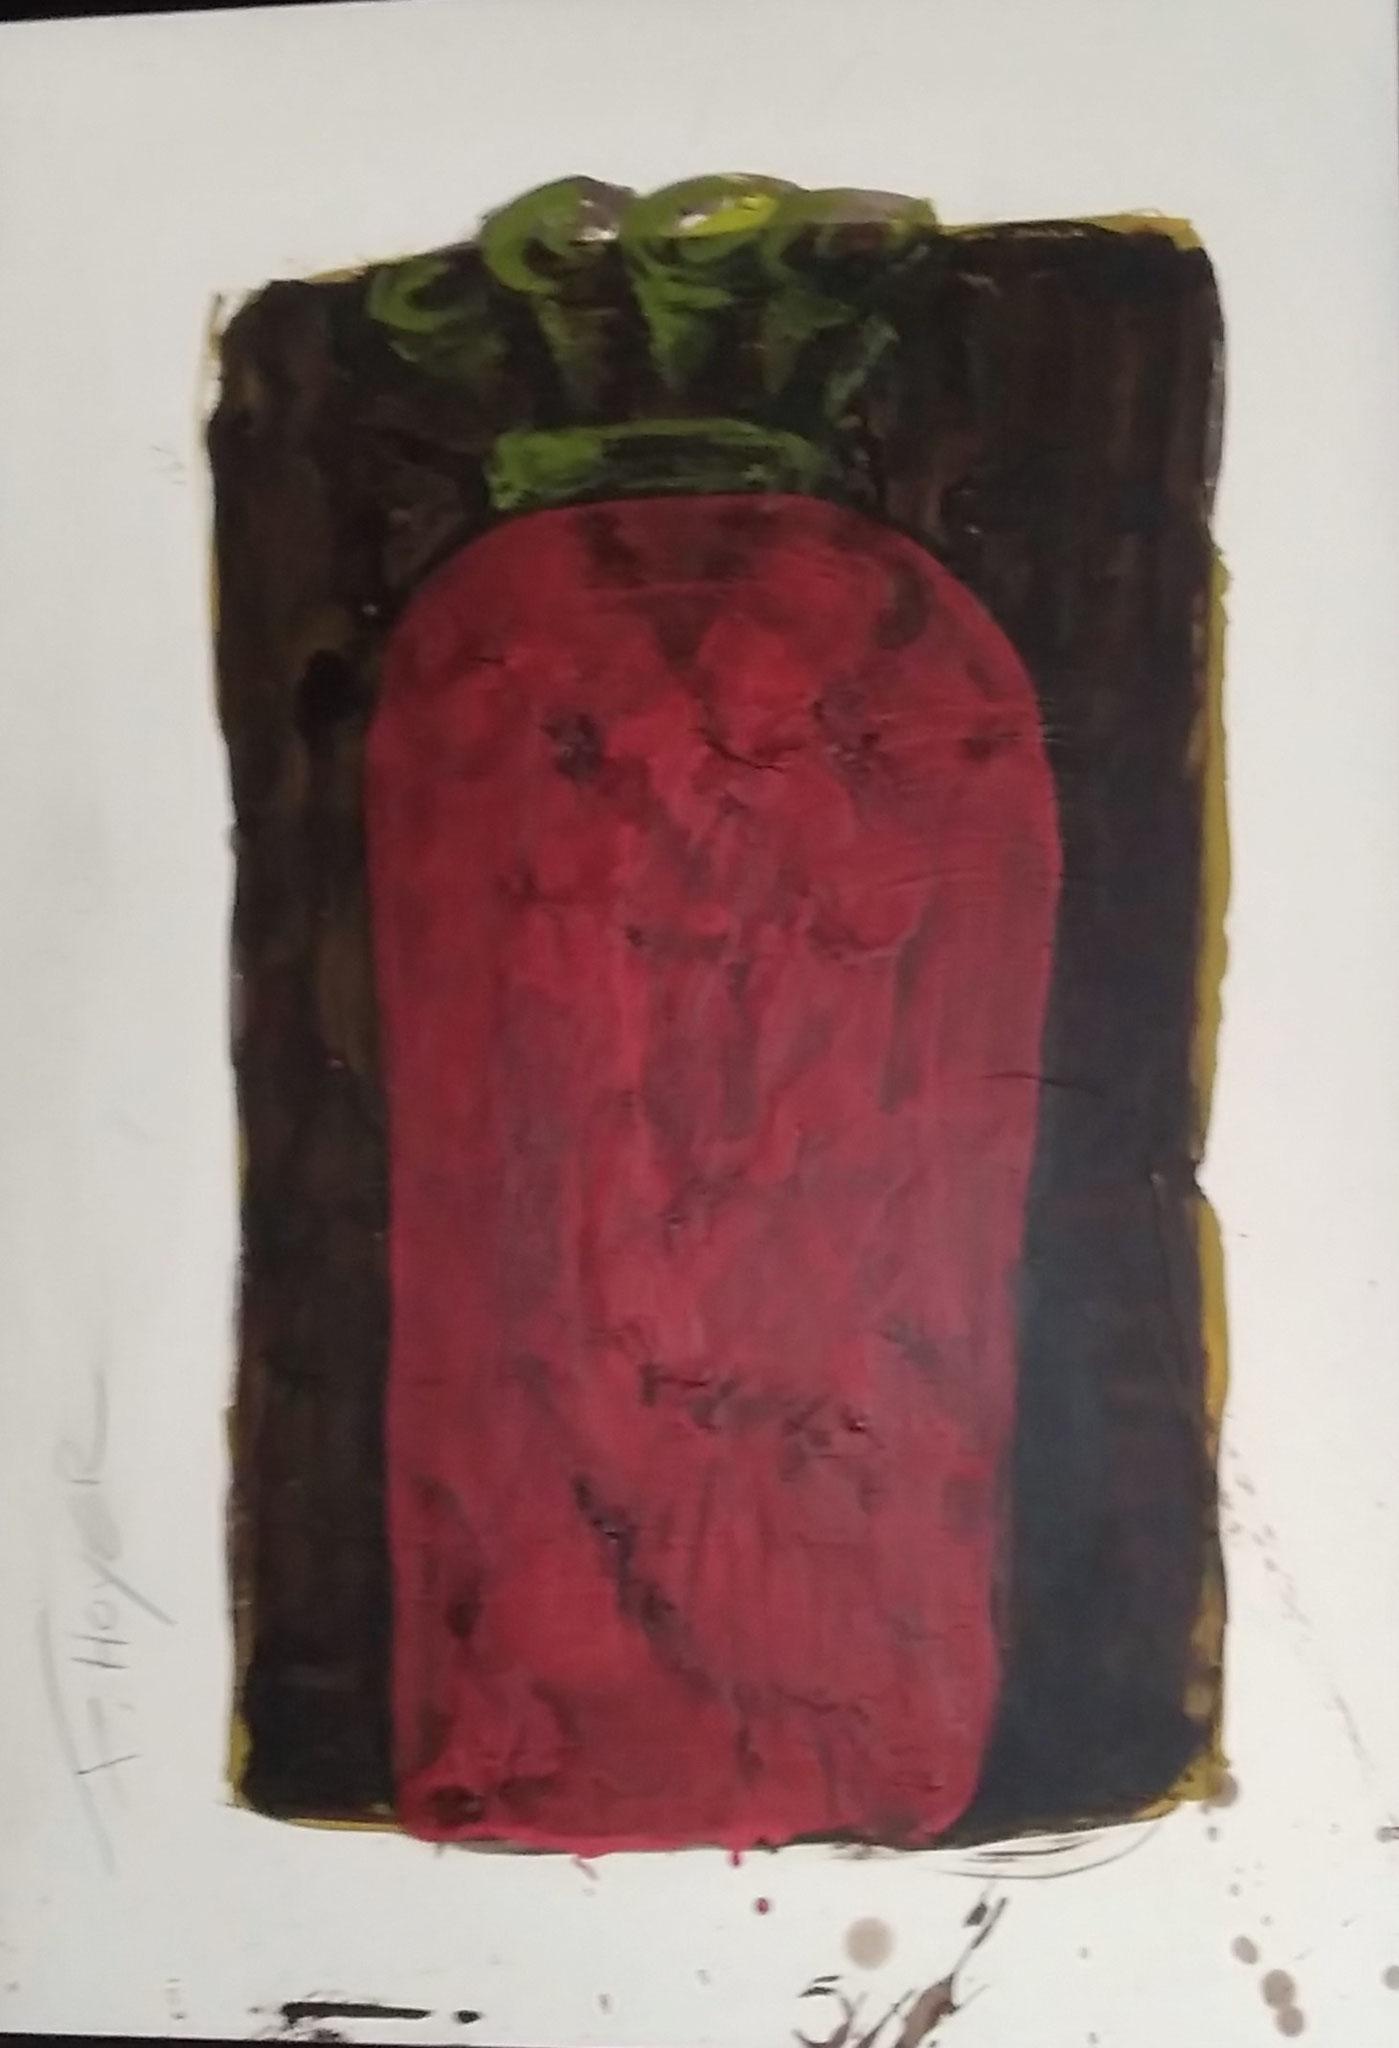 Le radis rouge